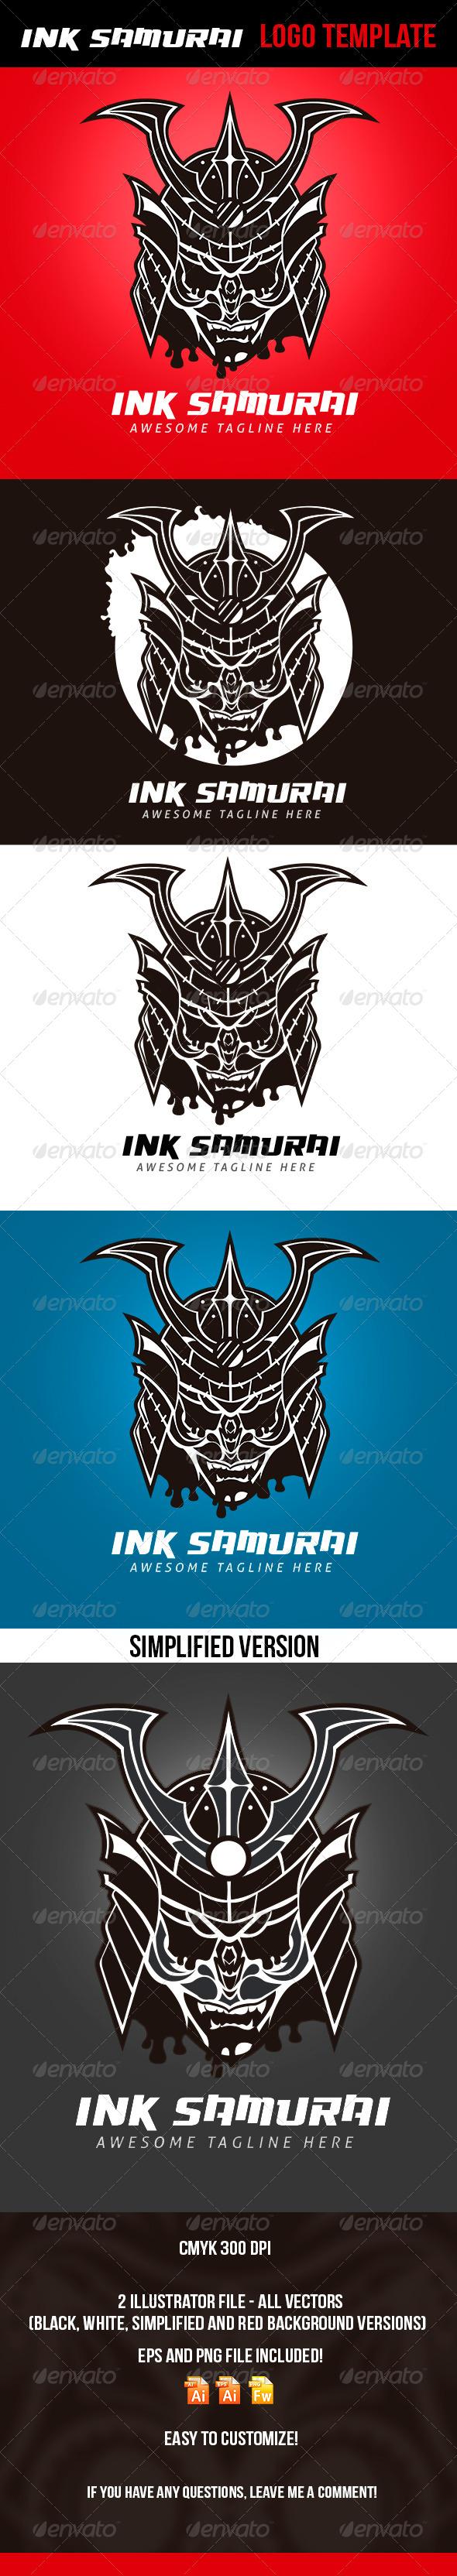 GraphicRiver Ink Samurai Logo Template 4592926